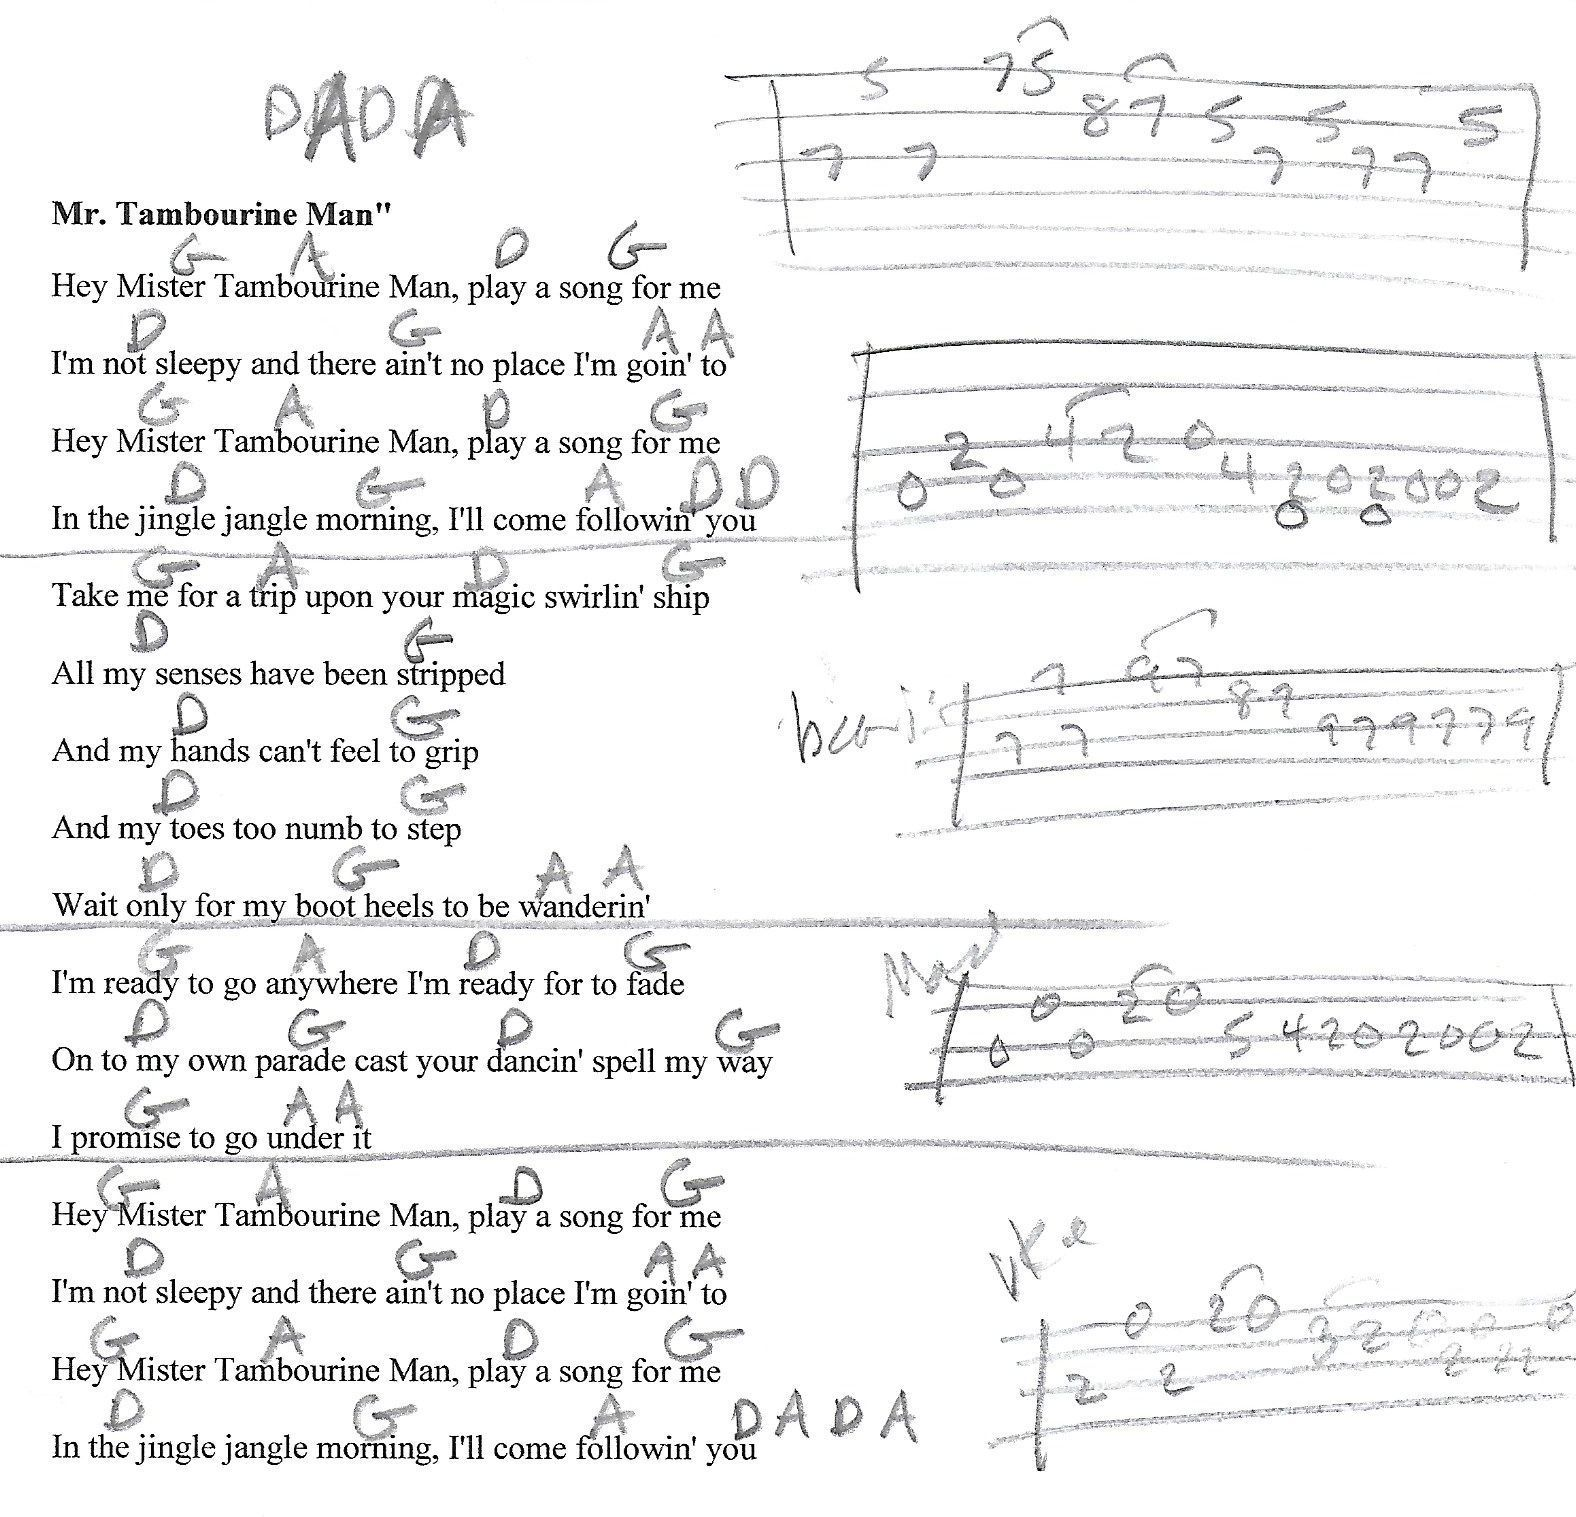 Mr Tambourine Man The Byrds Guitar Lesson Chord Chart With Lyrics